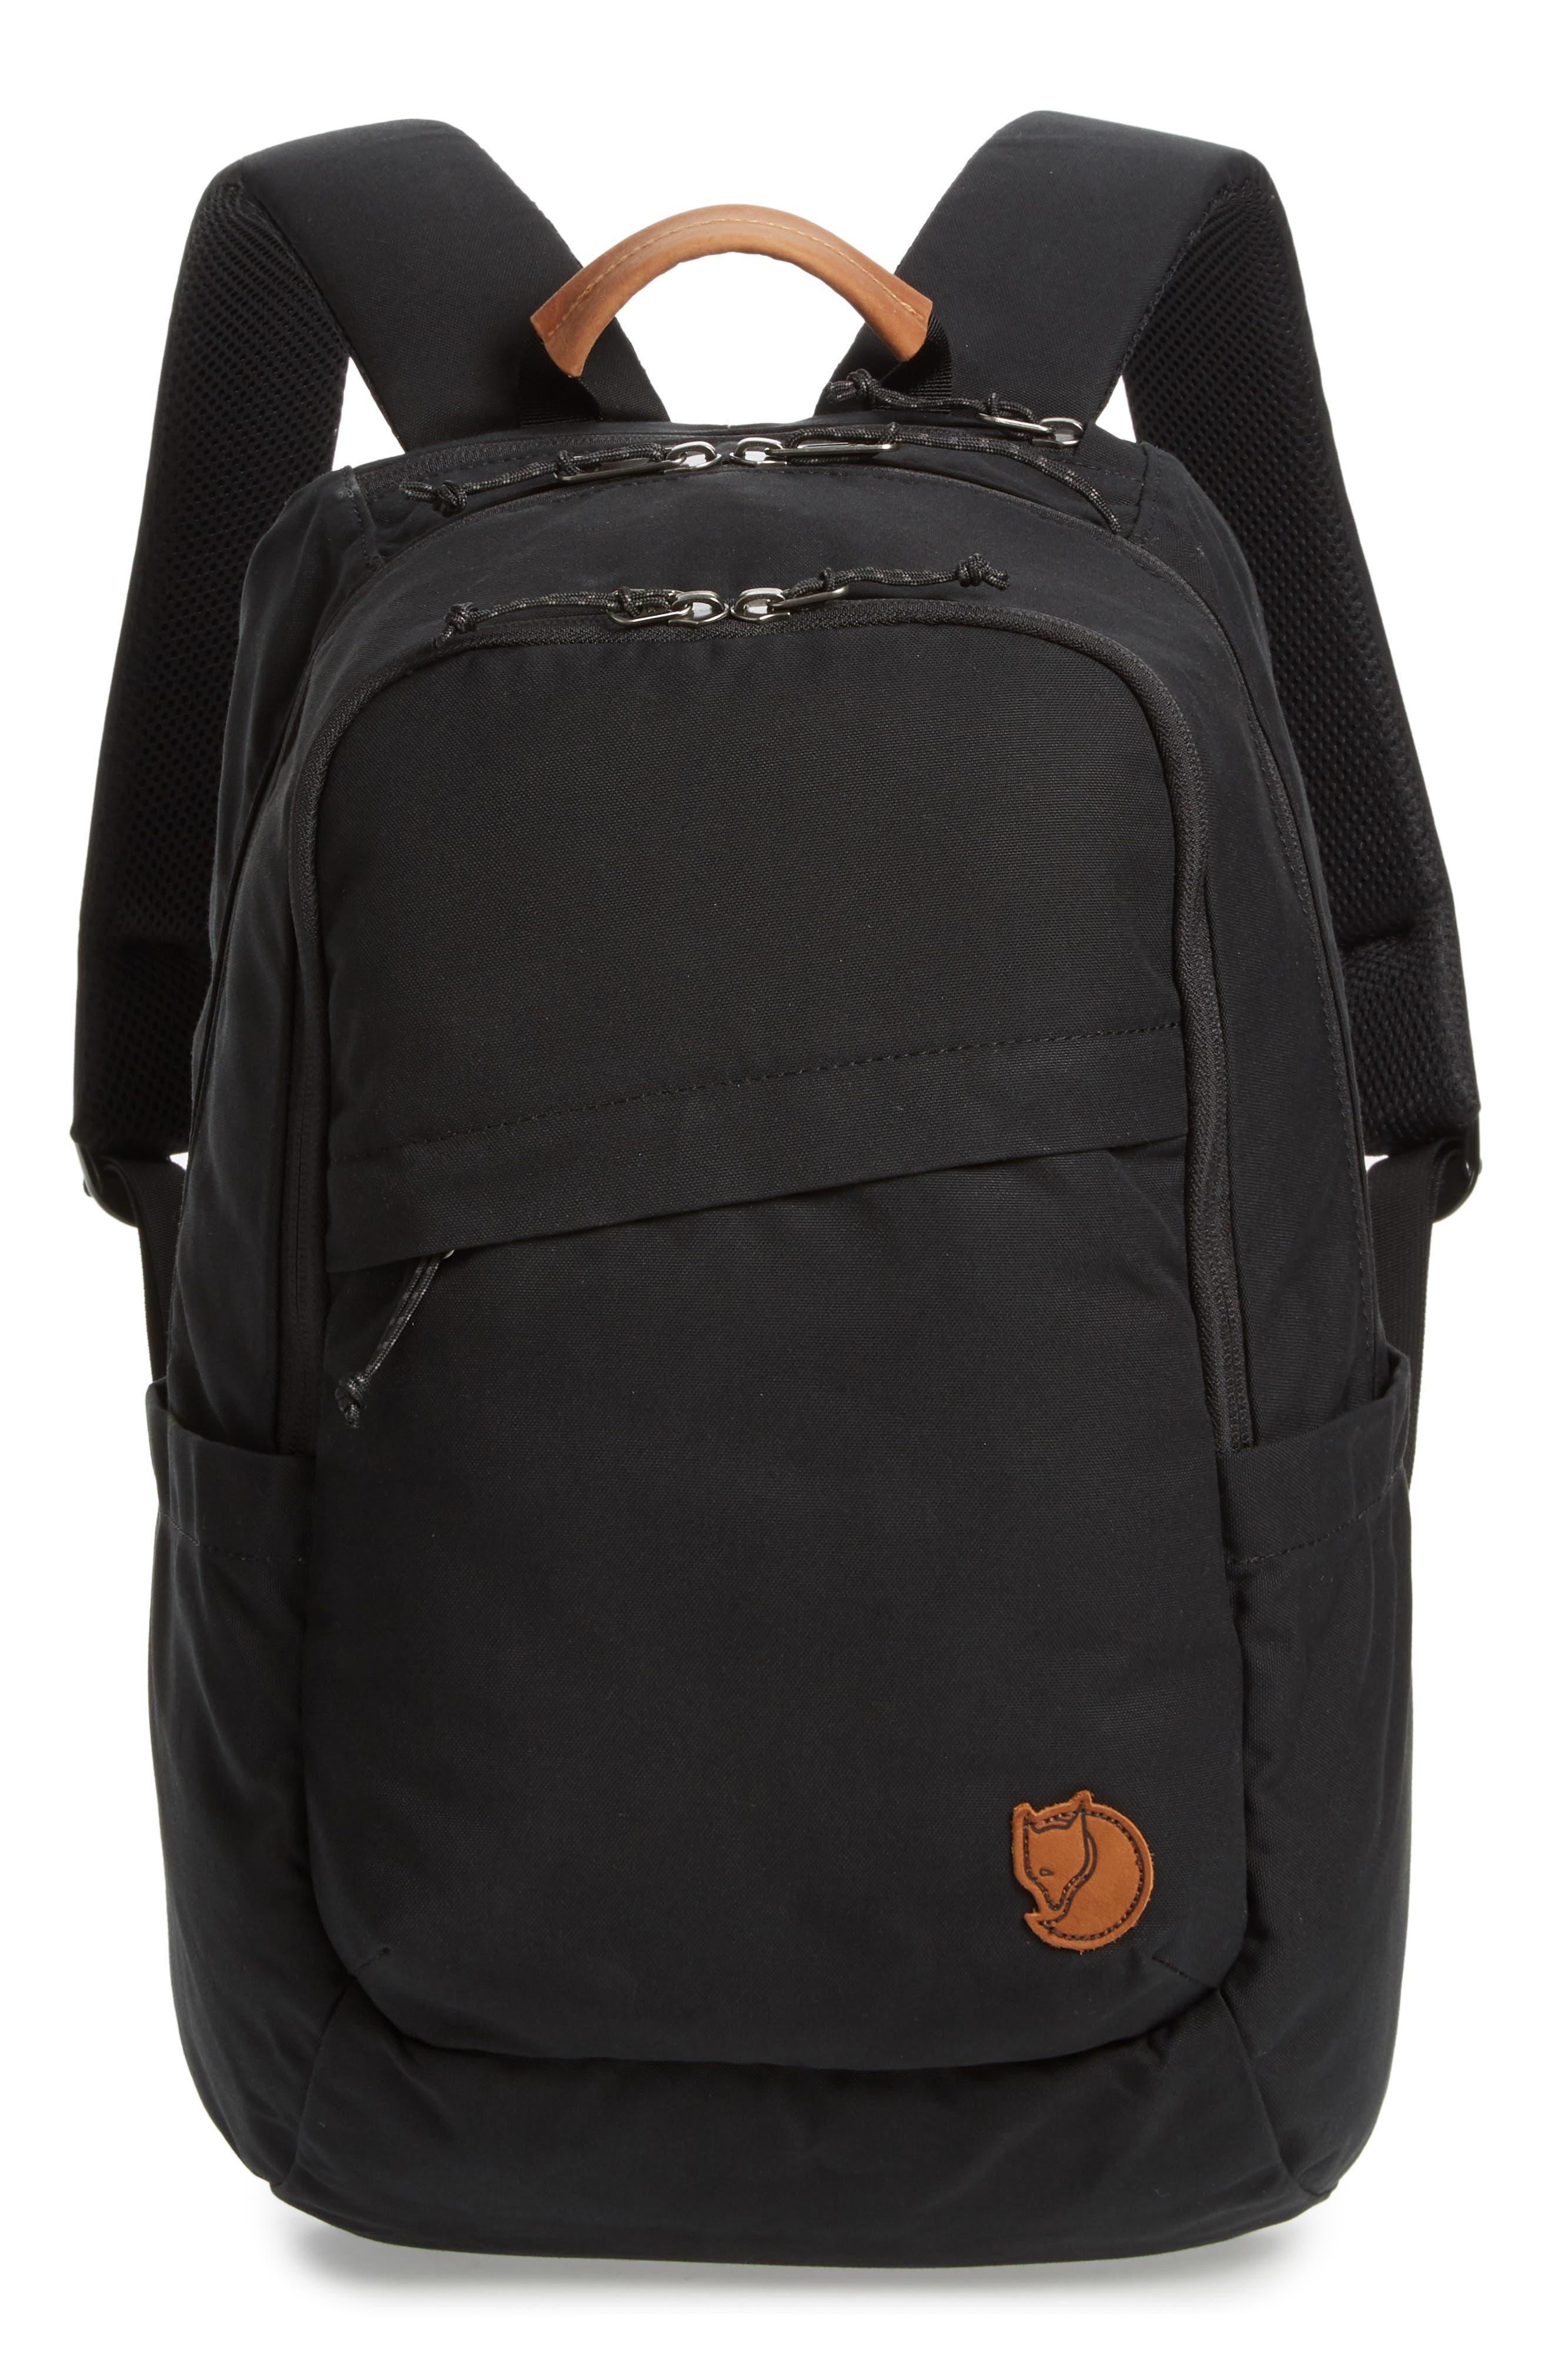 Räven 20L Backpack,                             Main thumbnail 1, color,                             BLACK